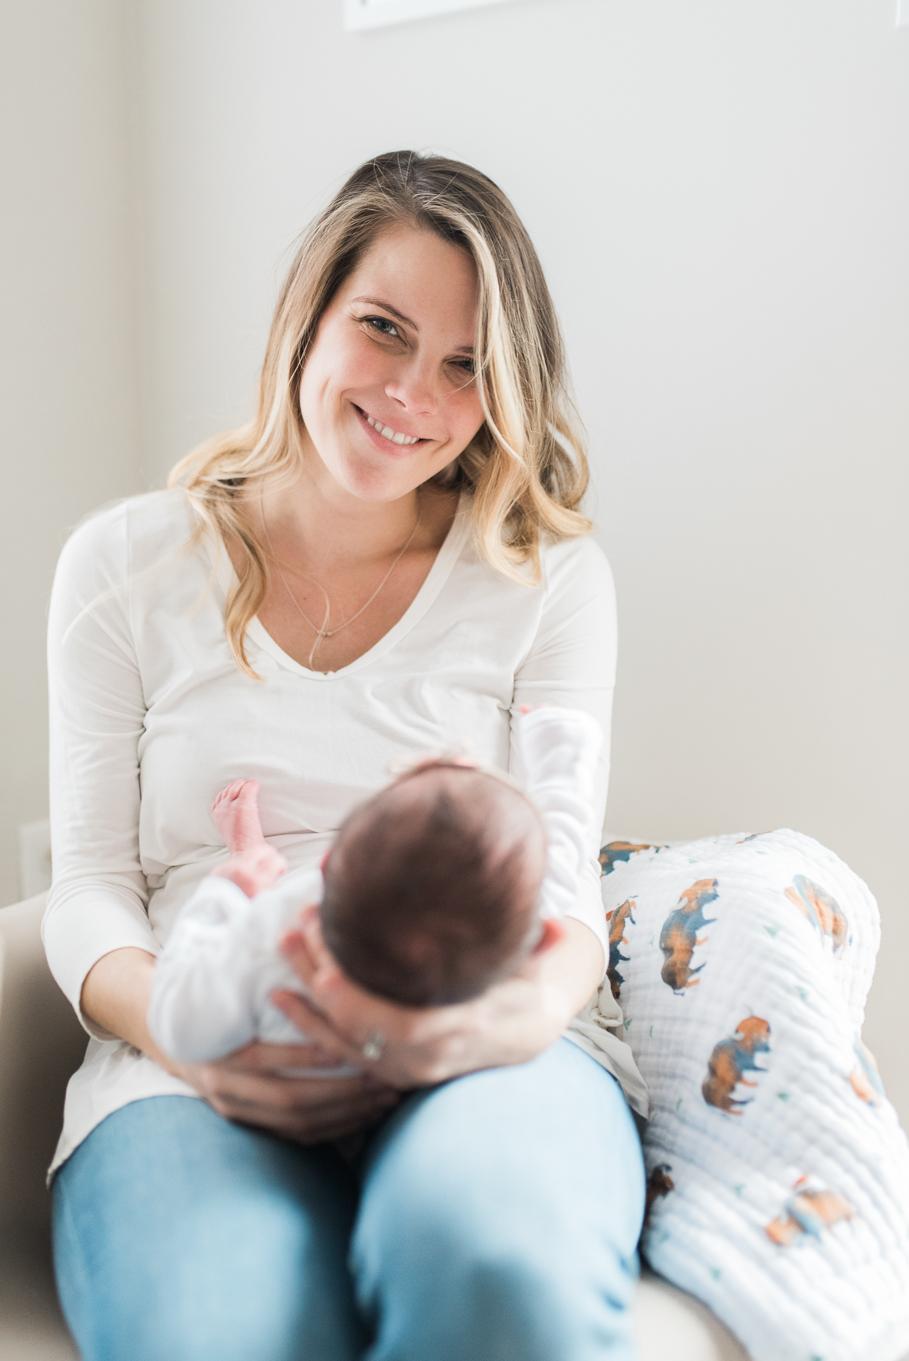 Baltimore-Maryland-Newborn-lifestyle-photographer-breanna kuhlmann-15.jpg